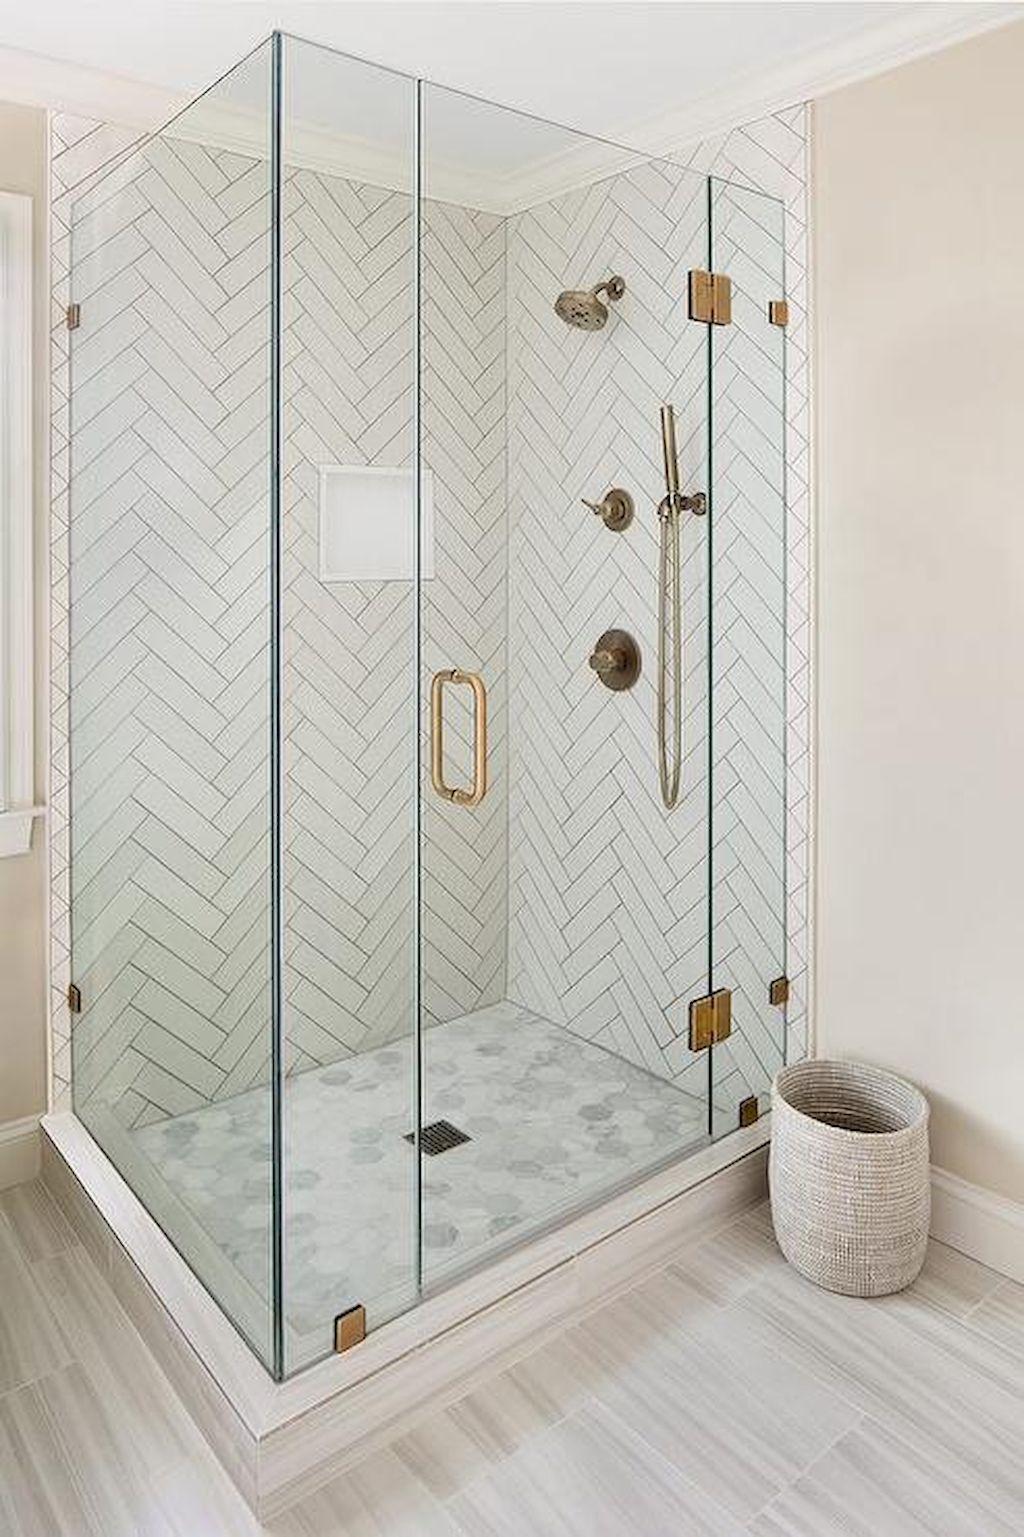 Small master bathroom tile makeover design ideas (25 ...